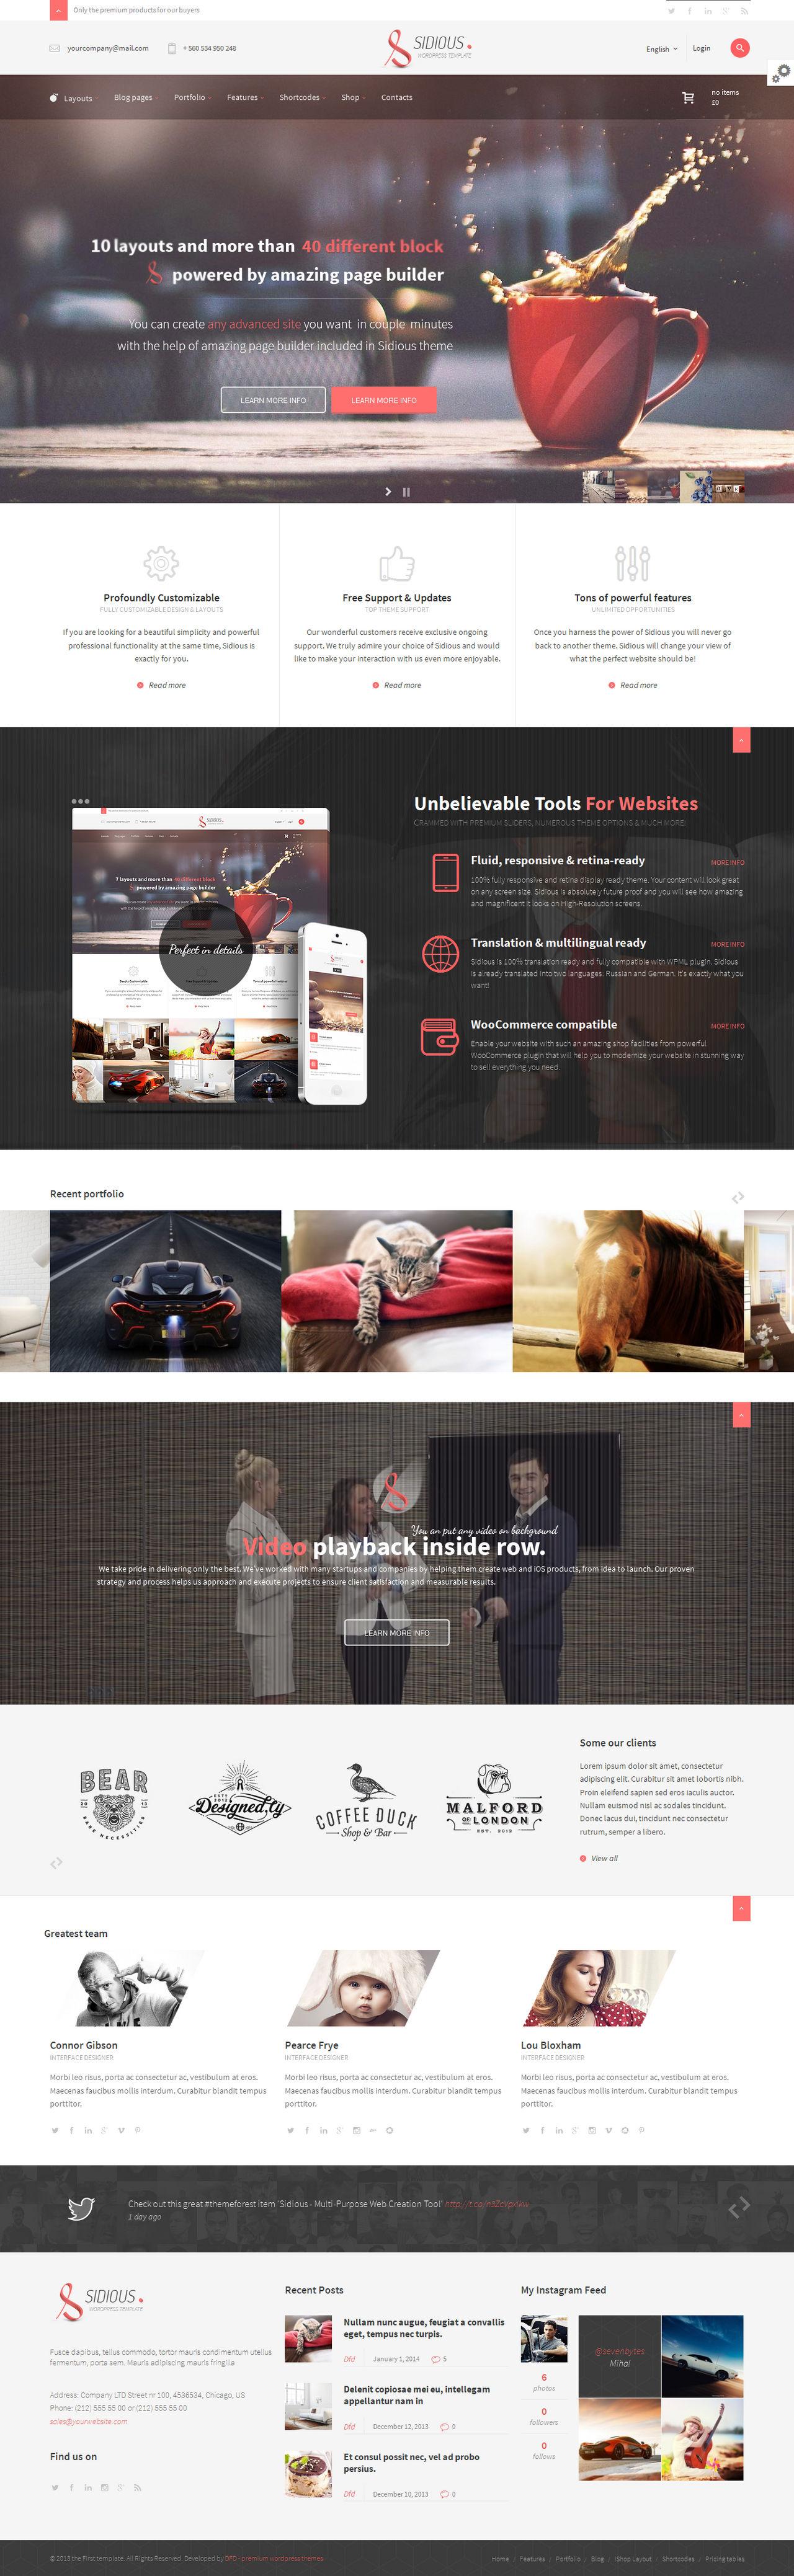 Sidious - Web Creation Tool by webdesigngeek